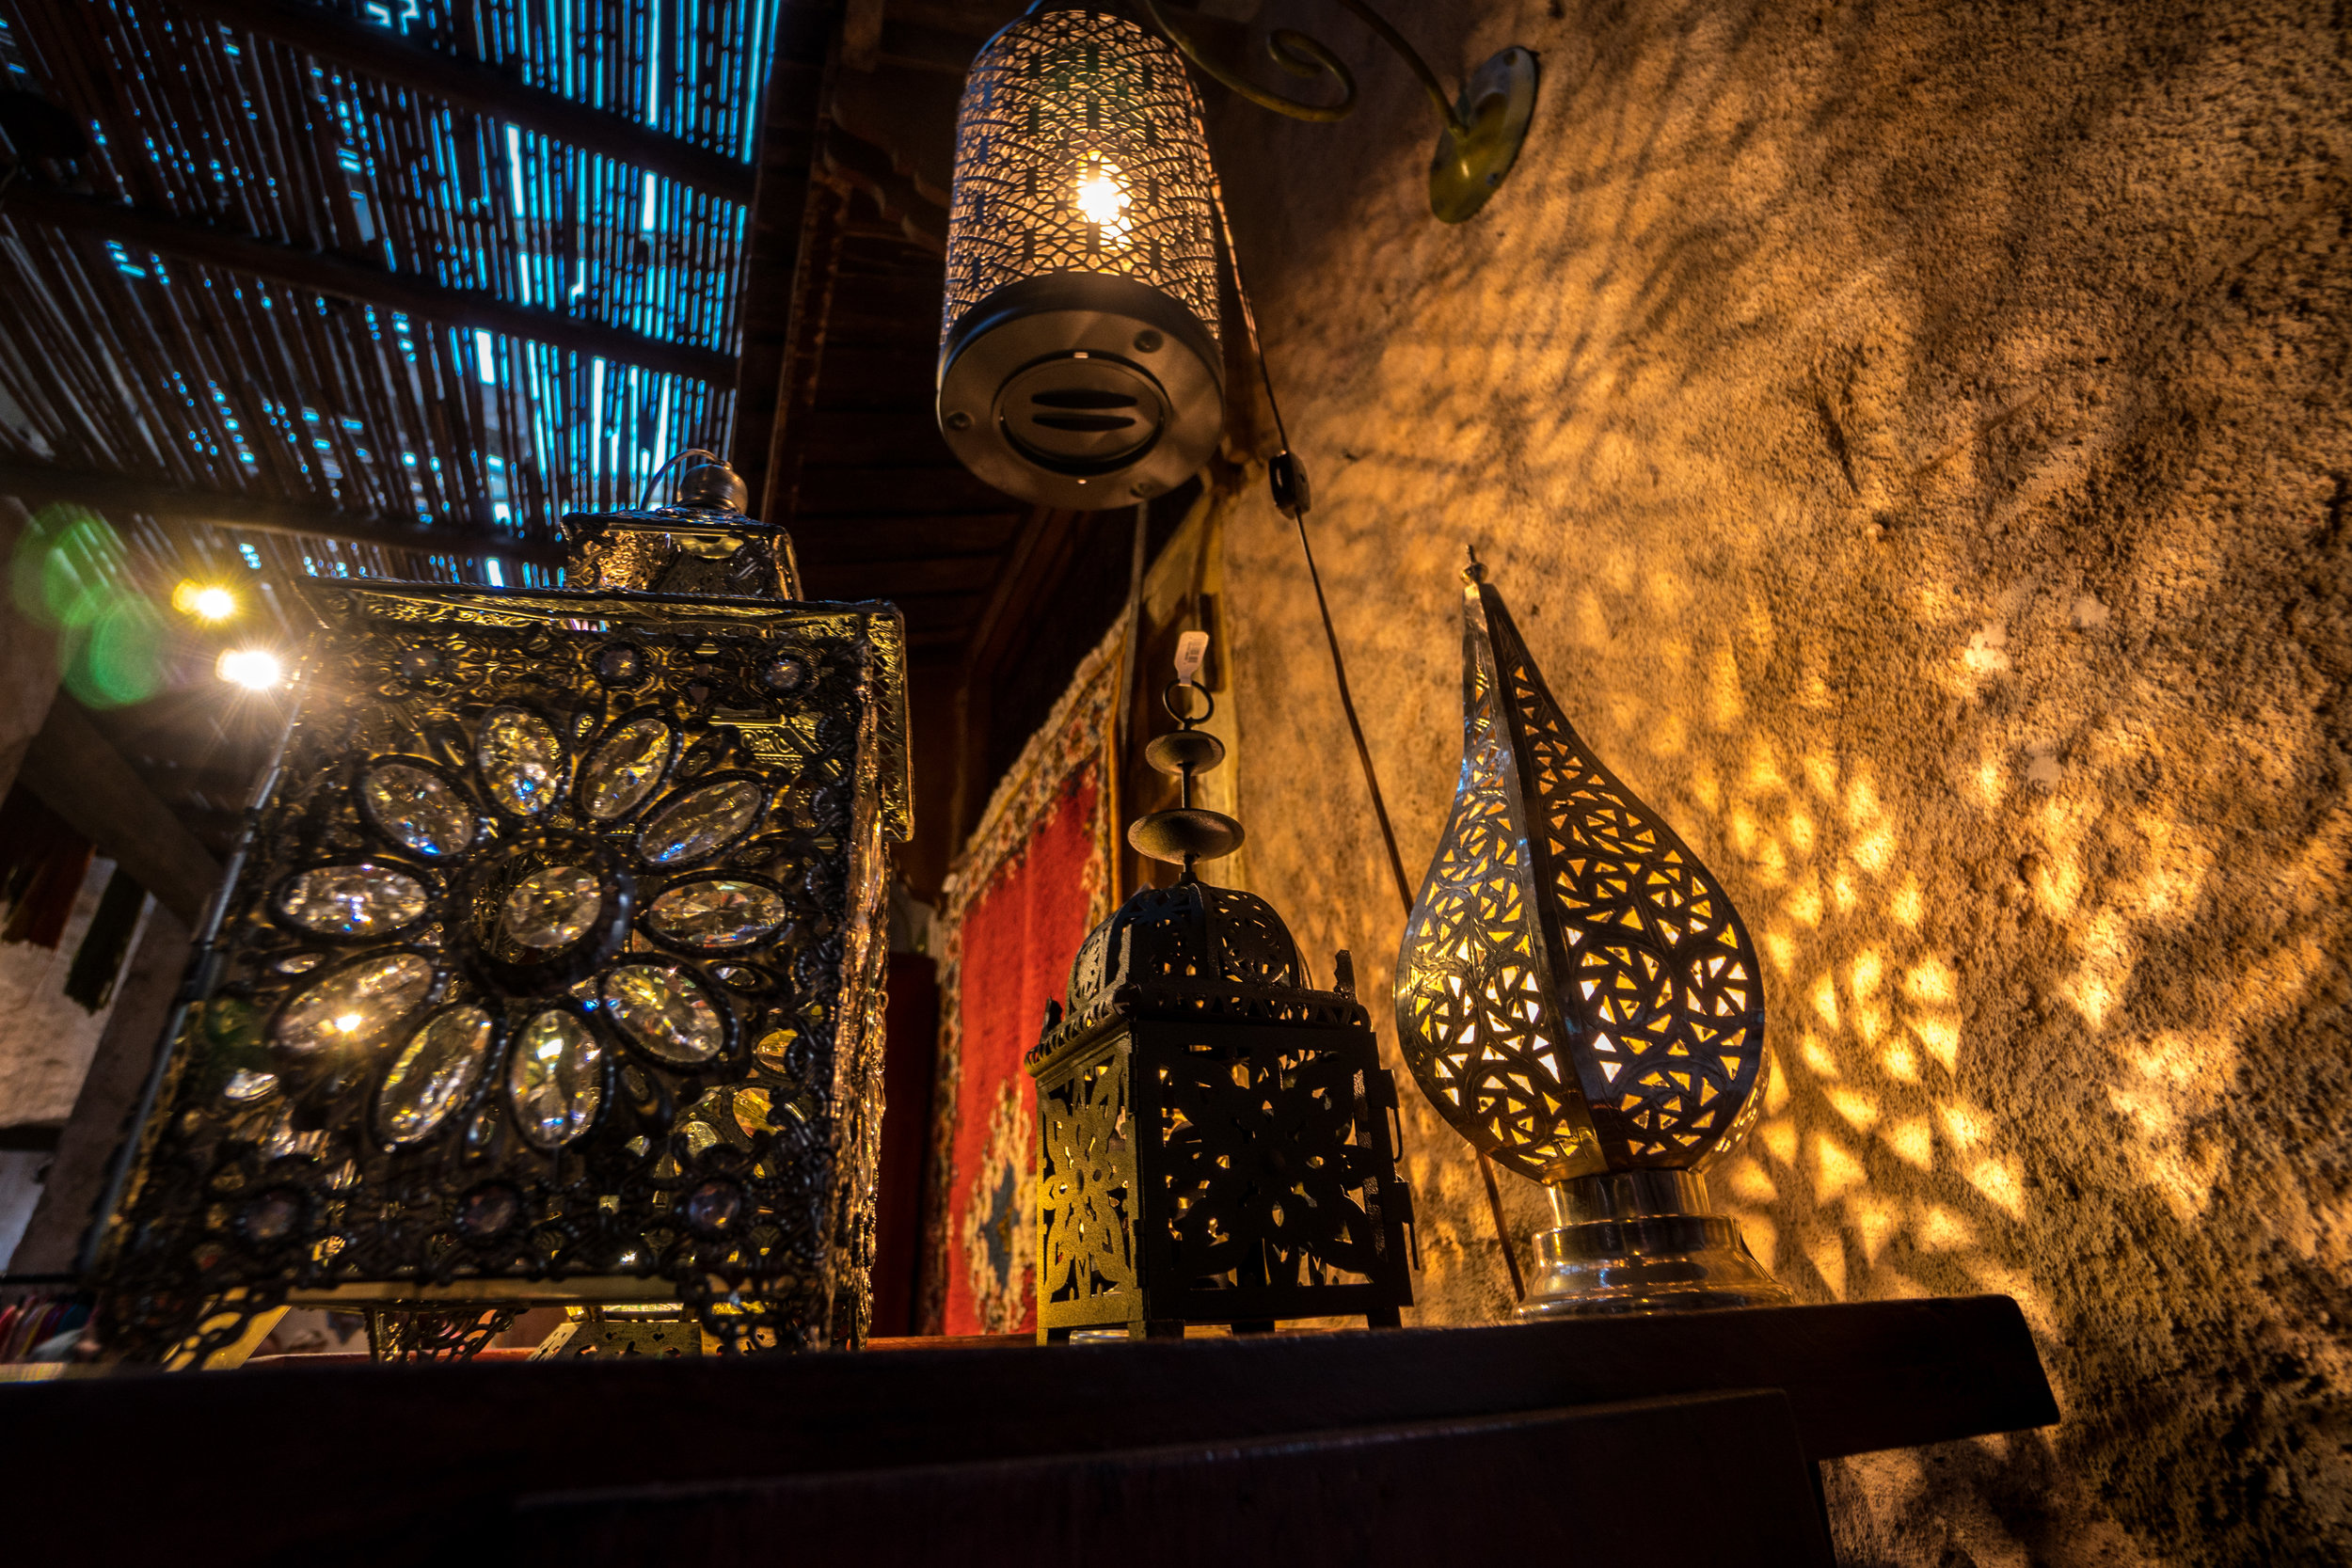 Lanterns of the Souk